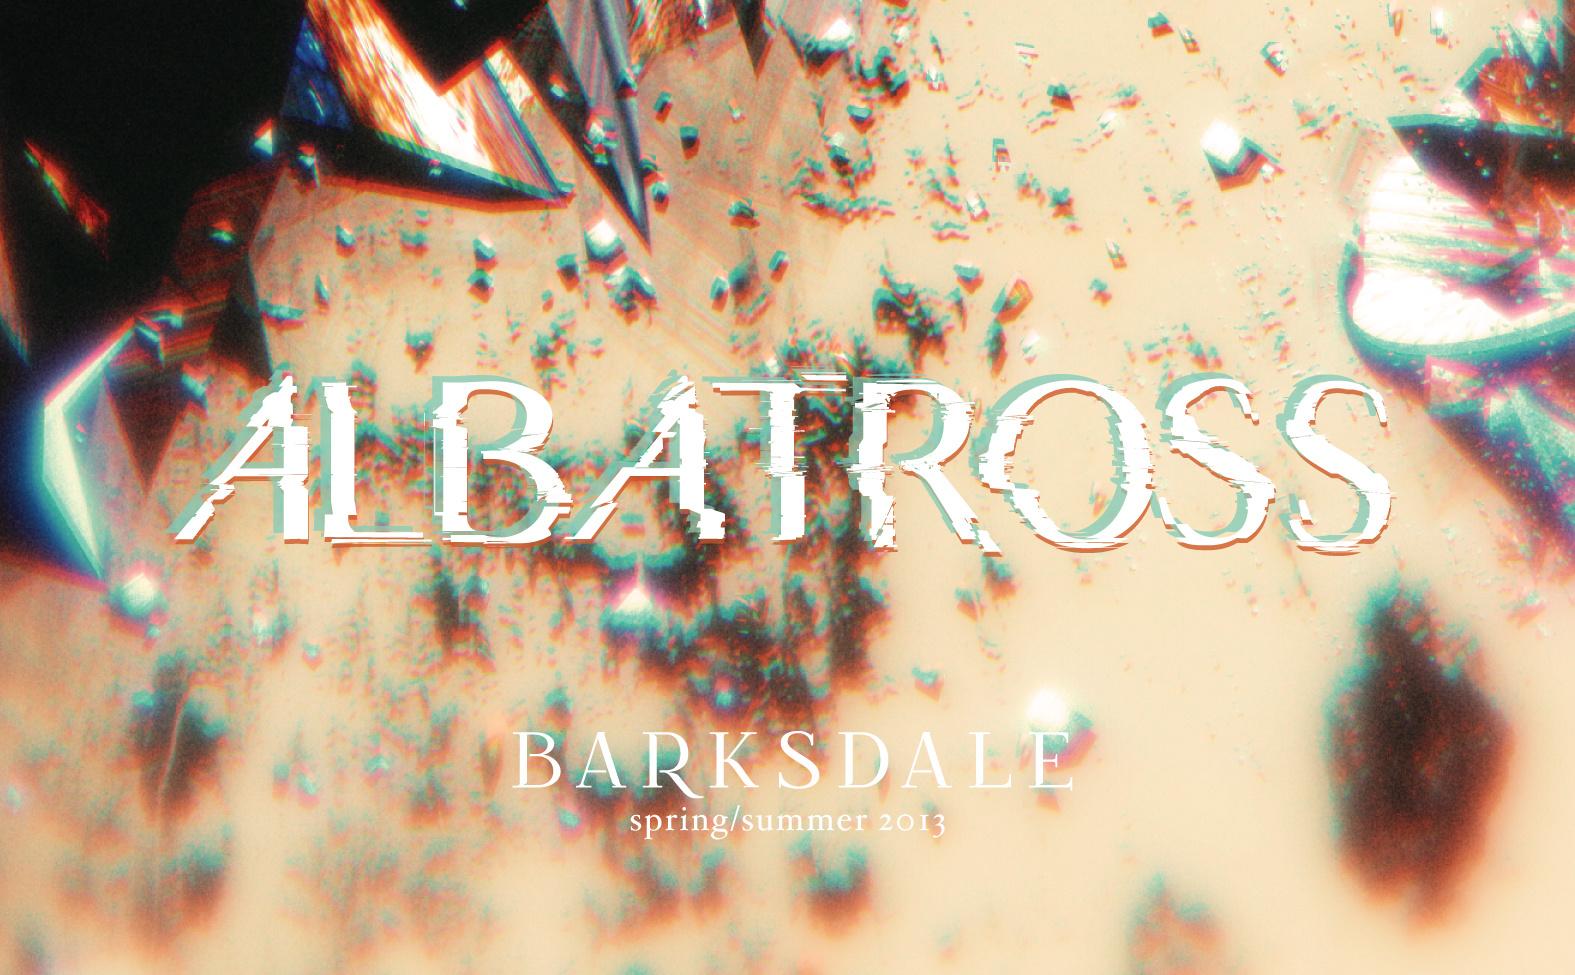 20568-1977131-Barksdale_SS13teaser_Final.jpg